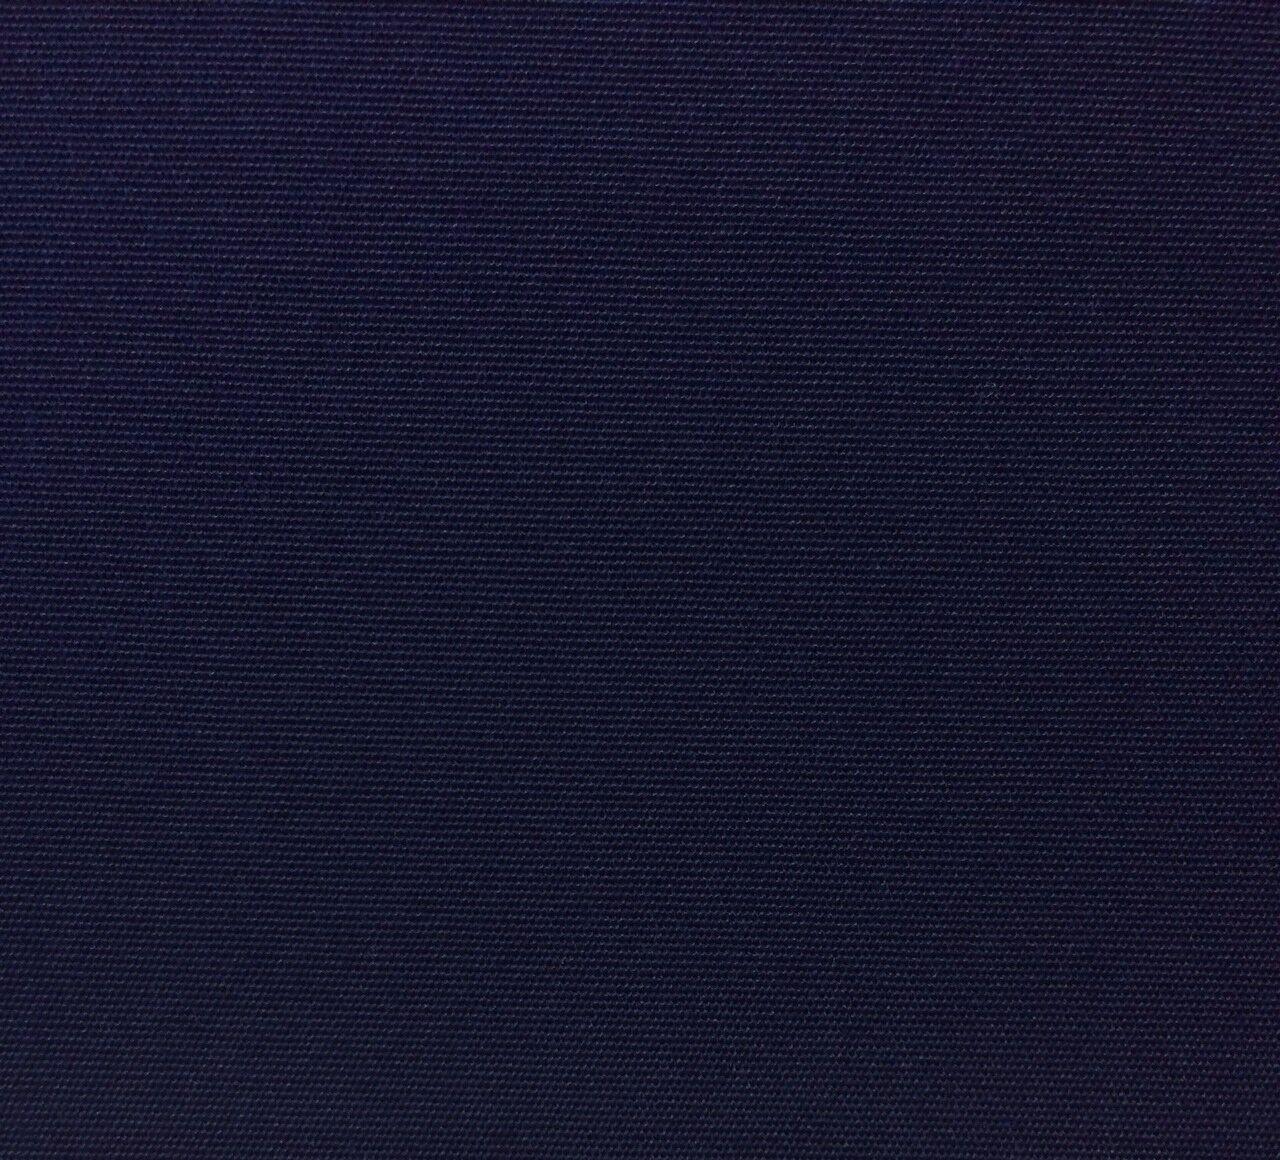 SUNBRELLA CANVAS CAPTAIN NAVY BLUE OUTDOOR LIVING FURNITURE